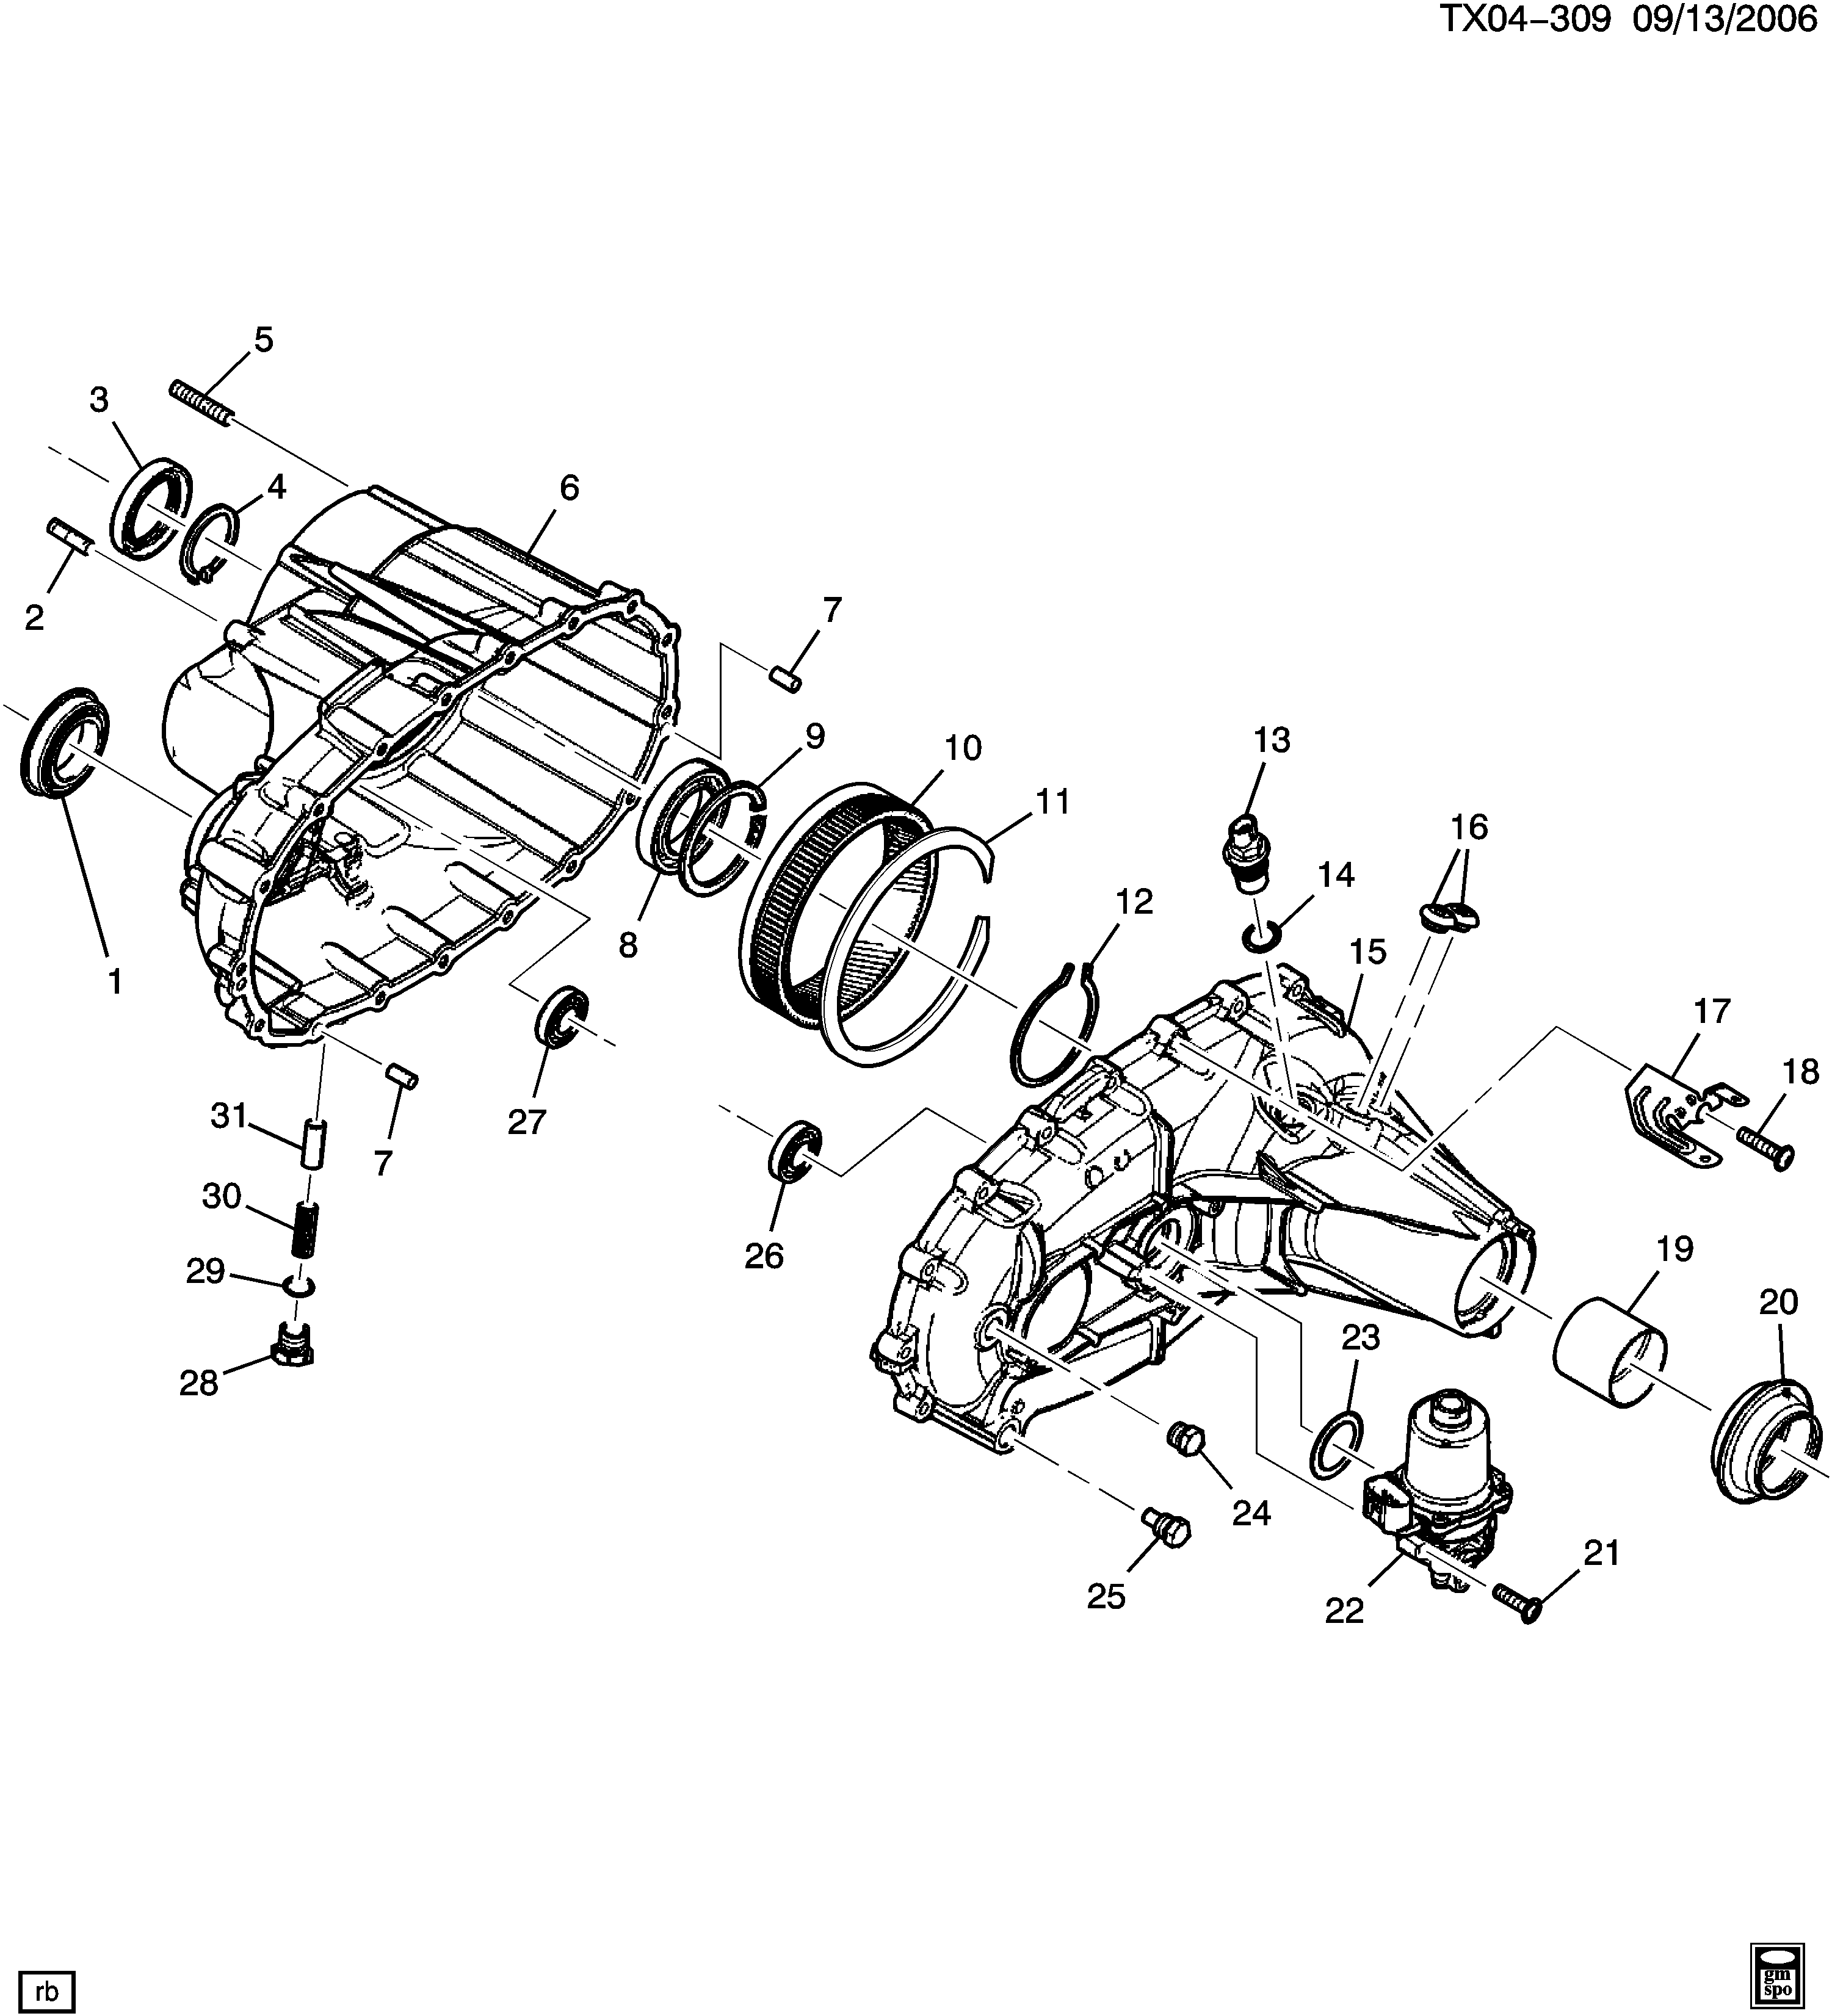 mp1625 transfer case parts